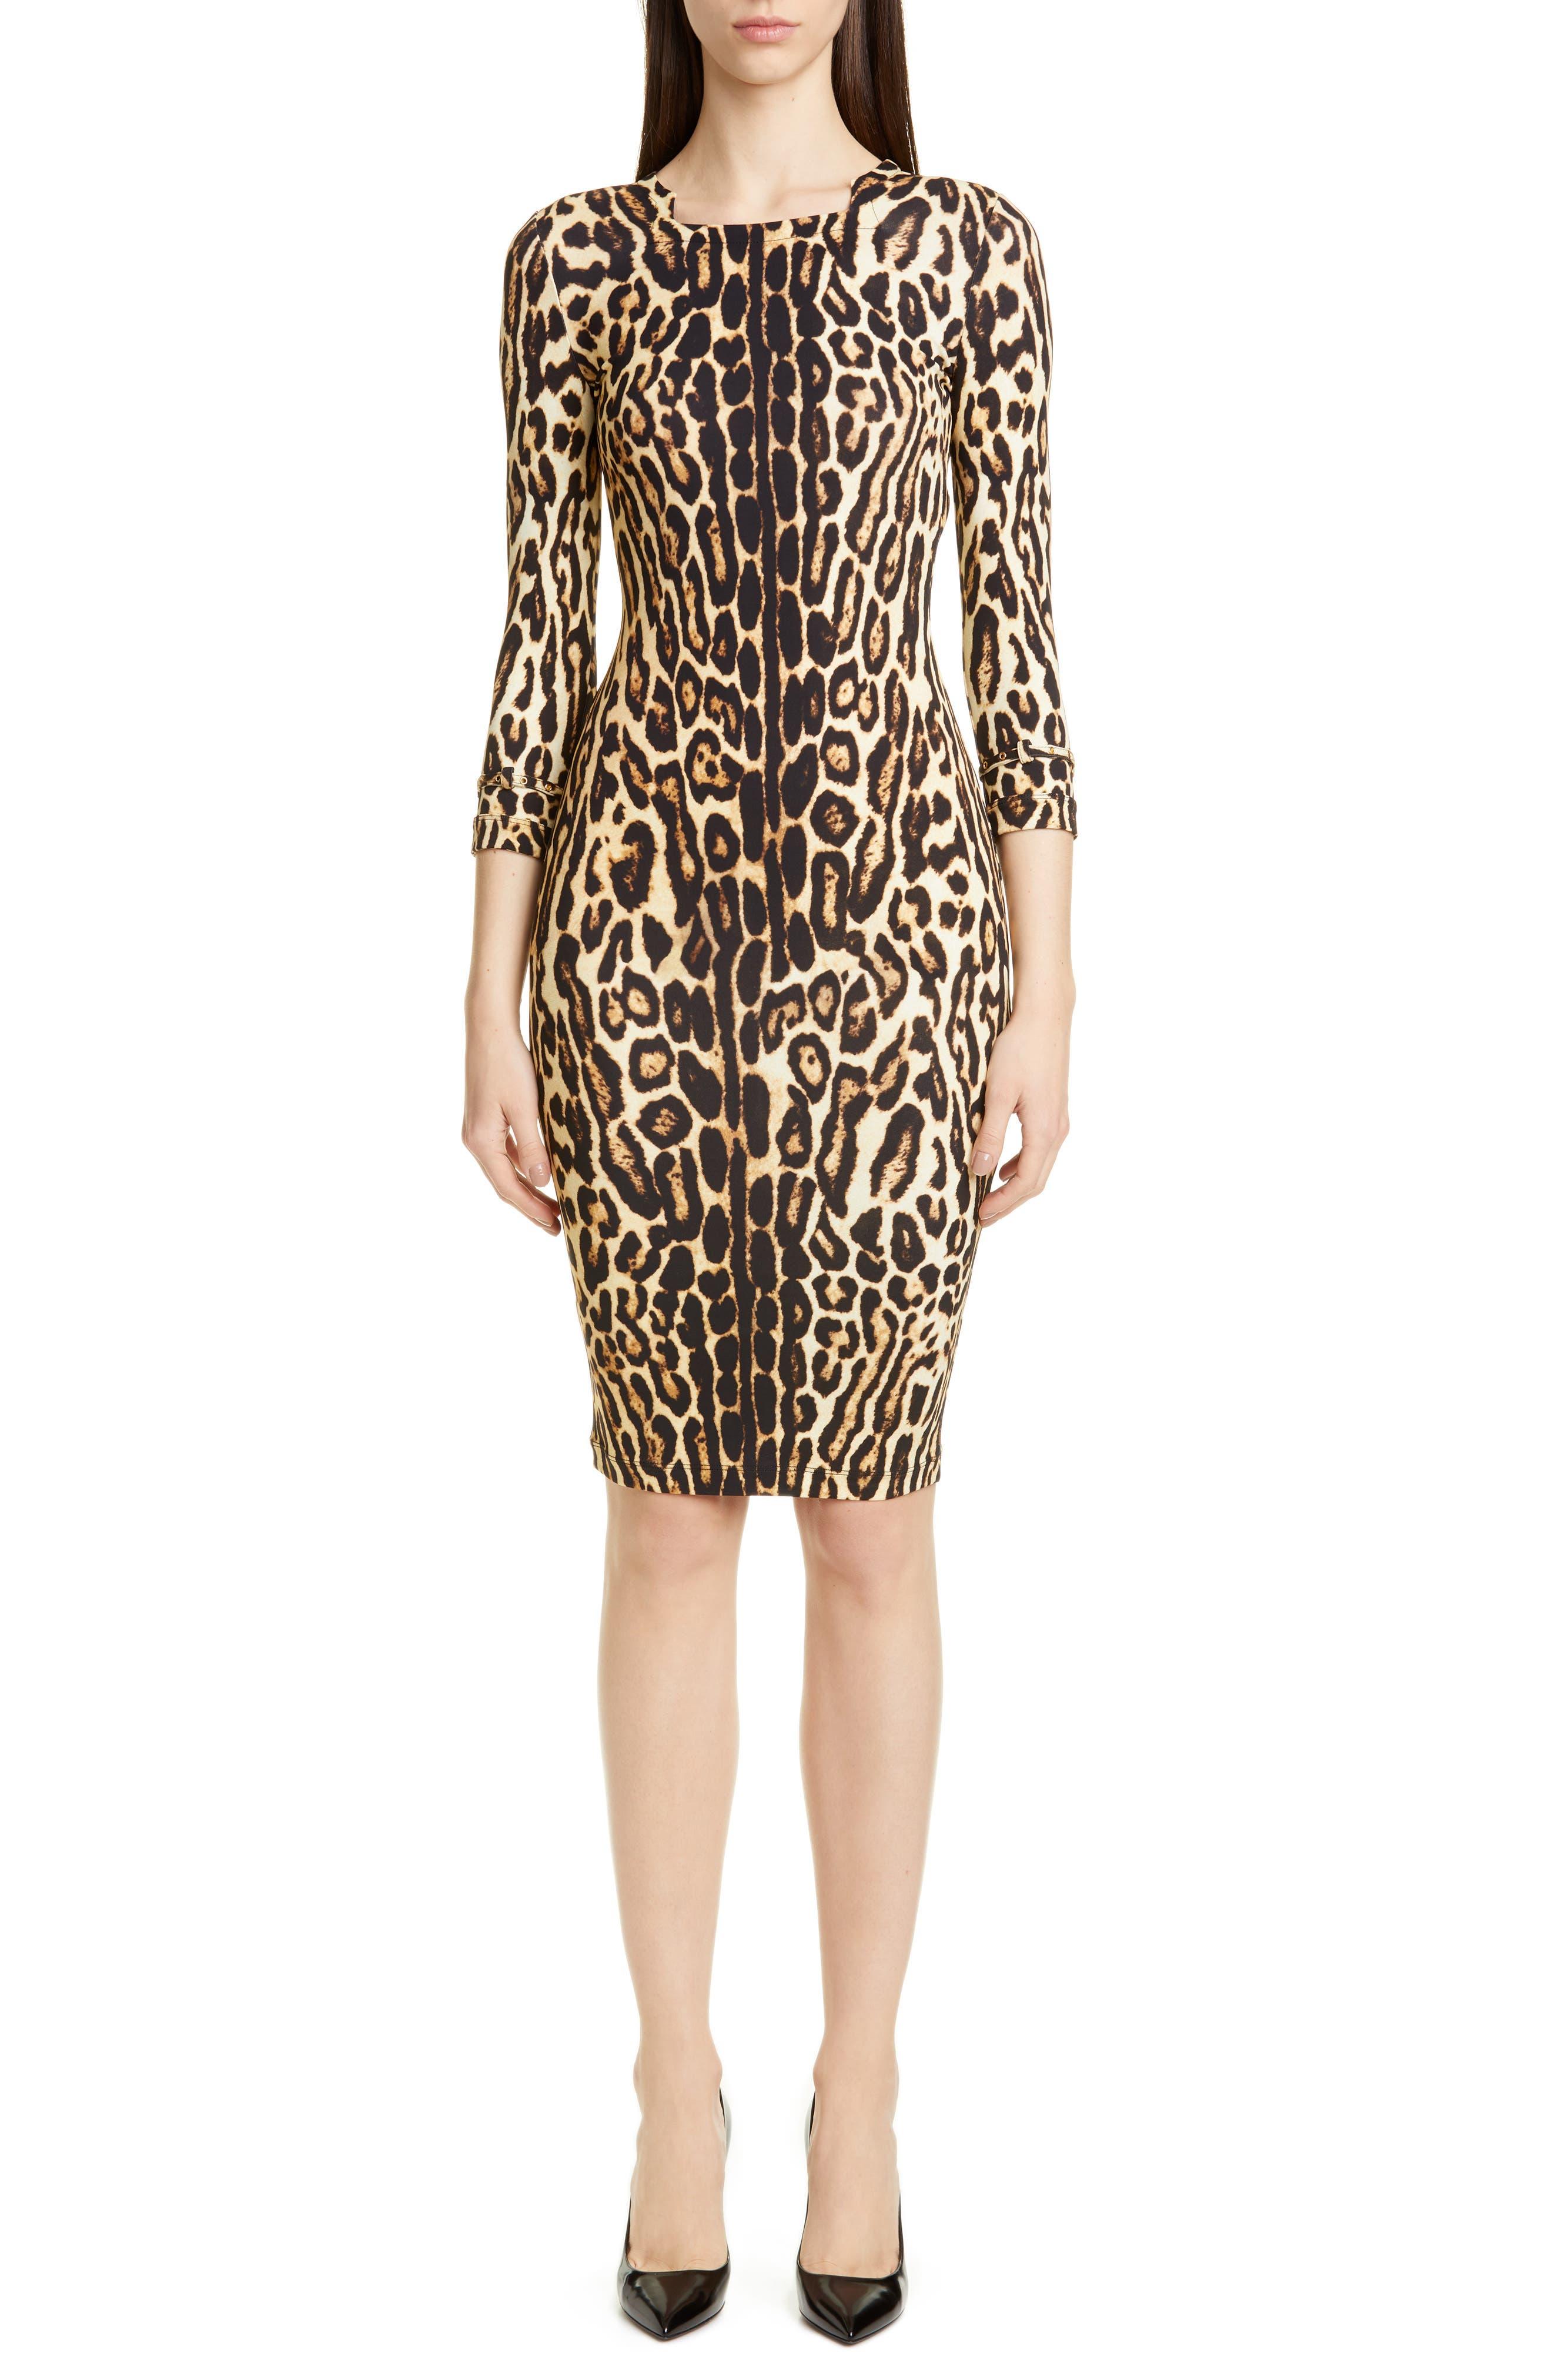 Burberry Leopard Print Body-Con Dress, Beige